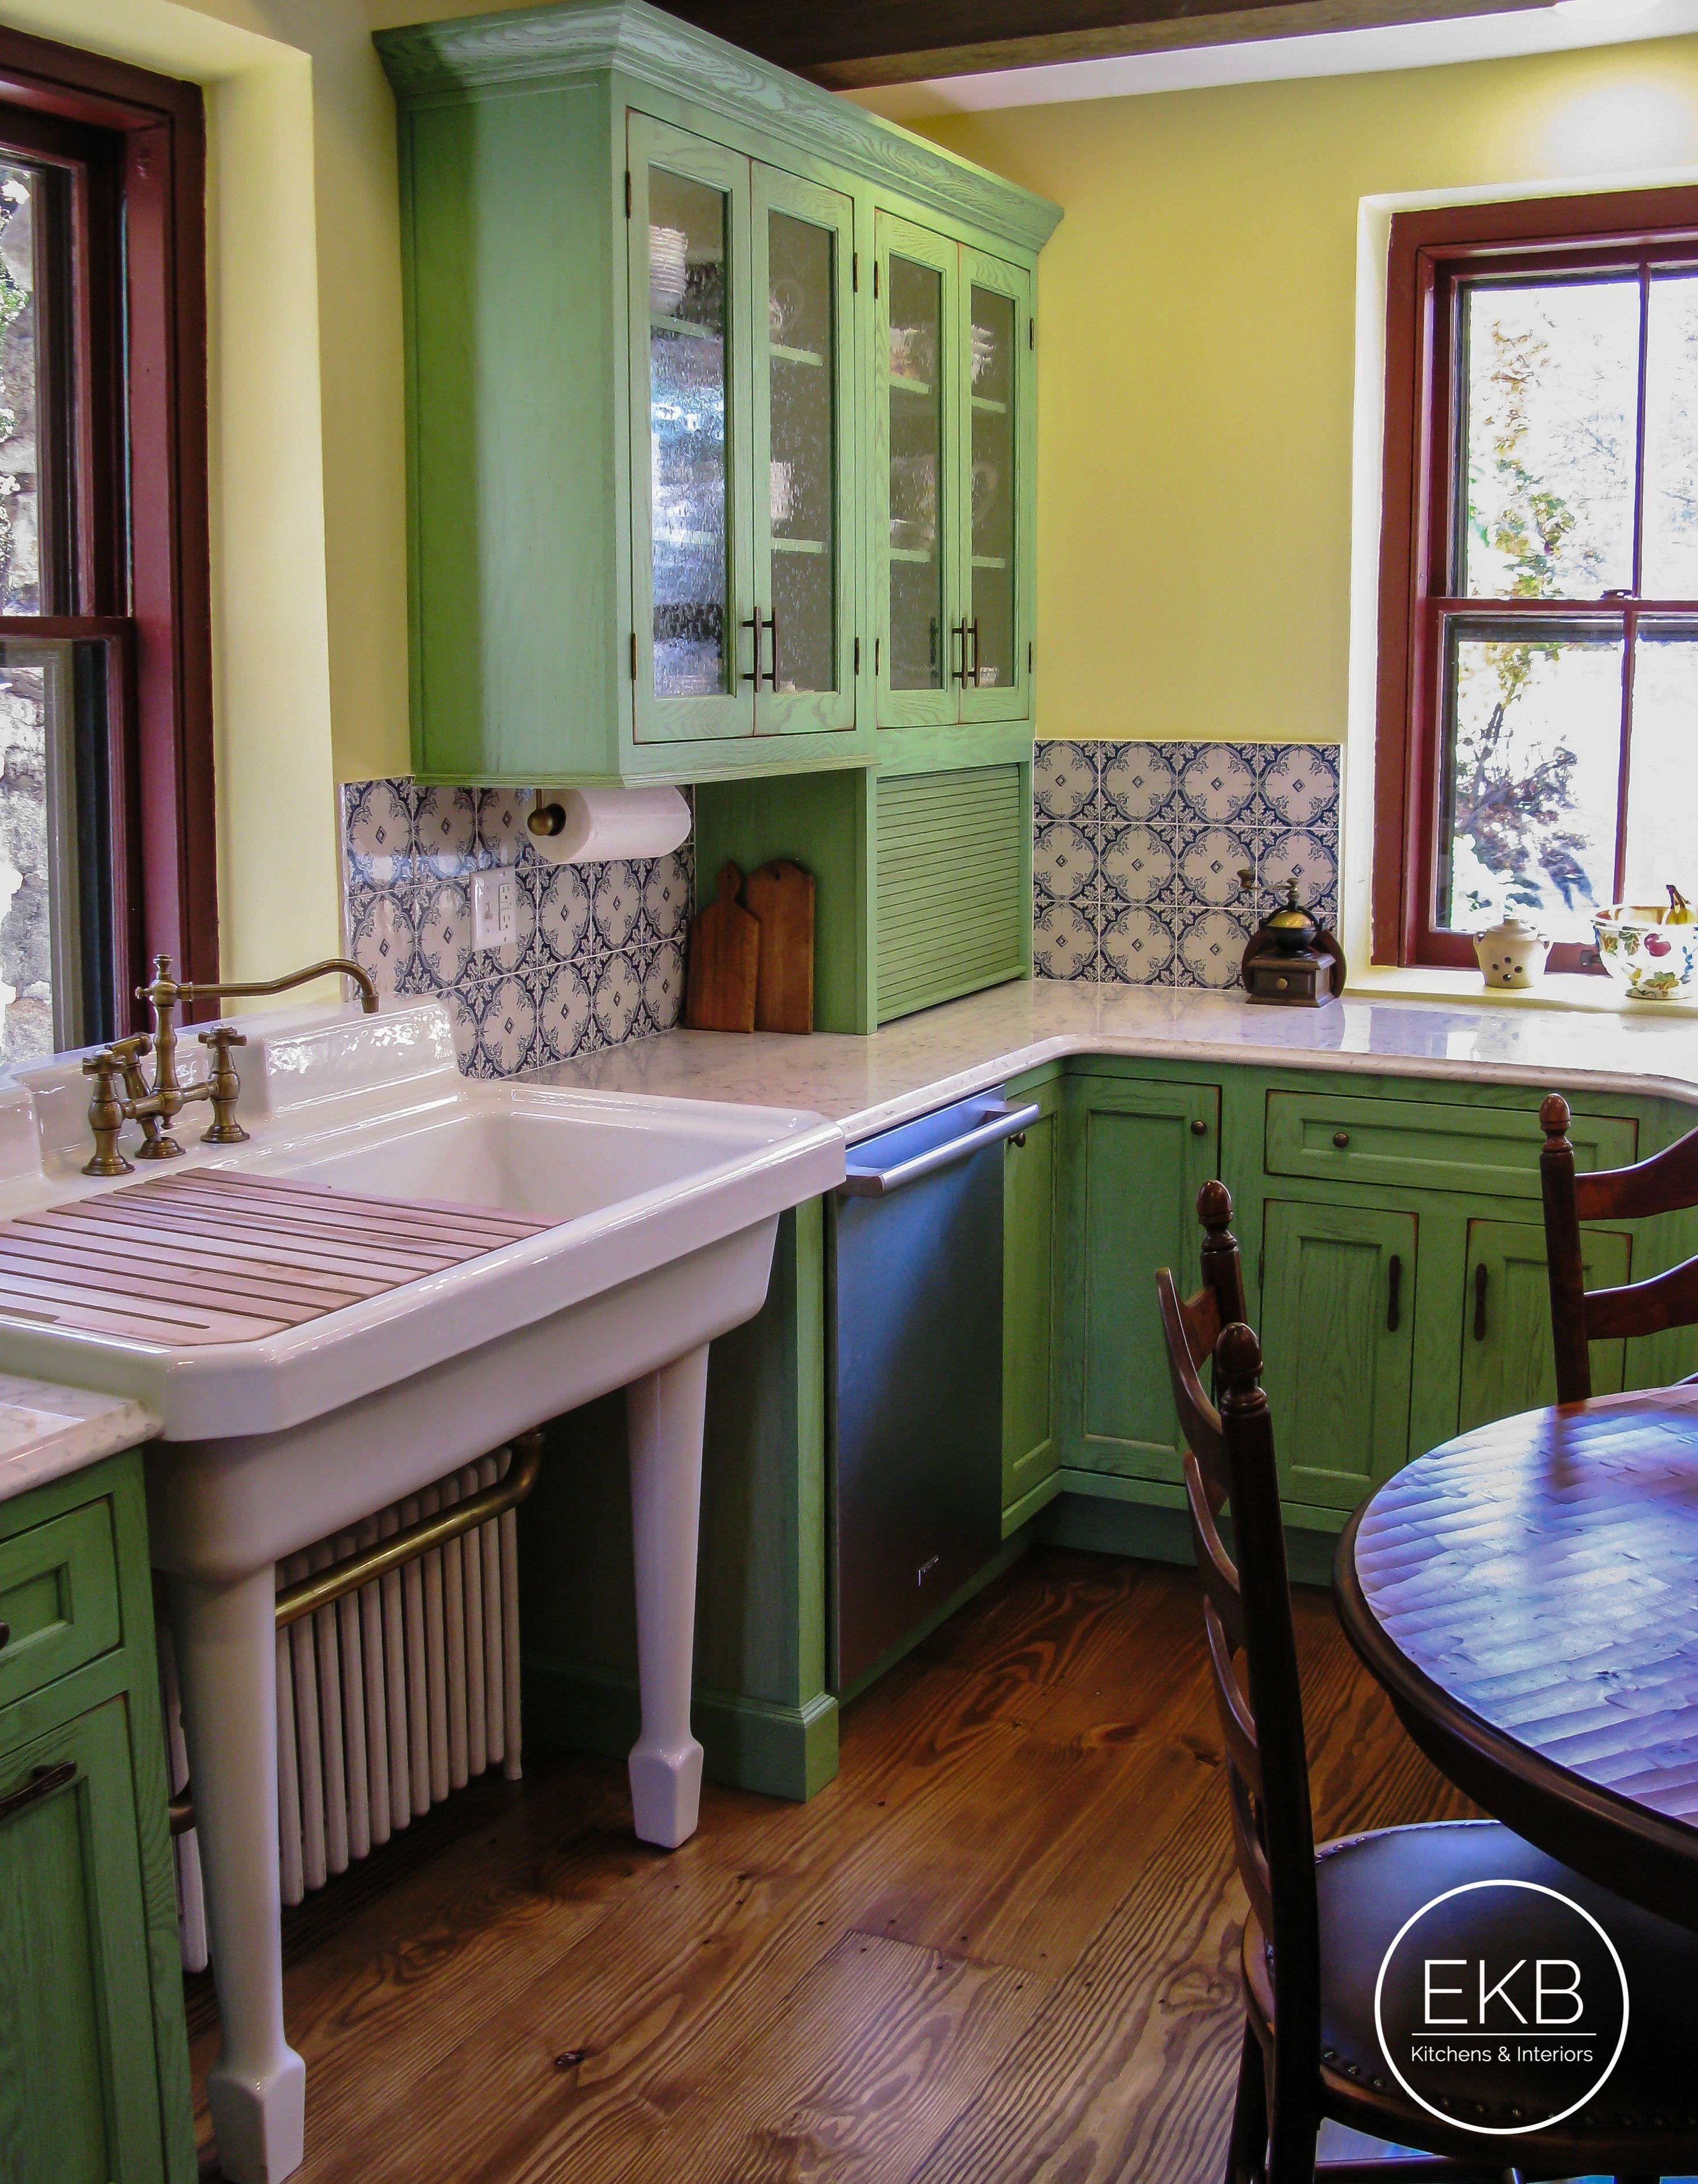 Pin by EKB Kitchens & Interiors on EKB Kitchens Kitchen